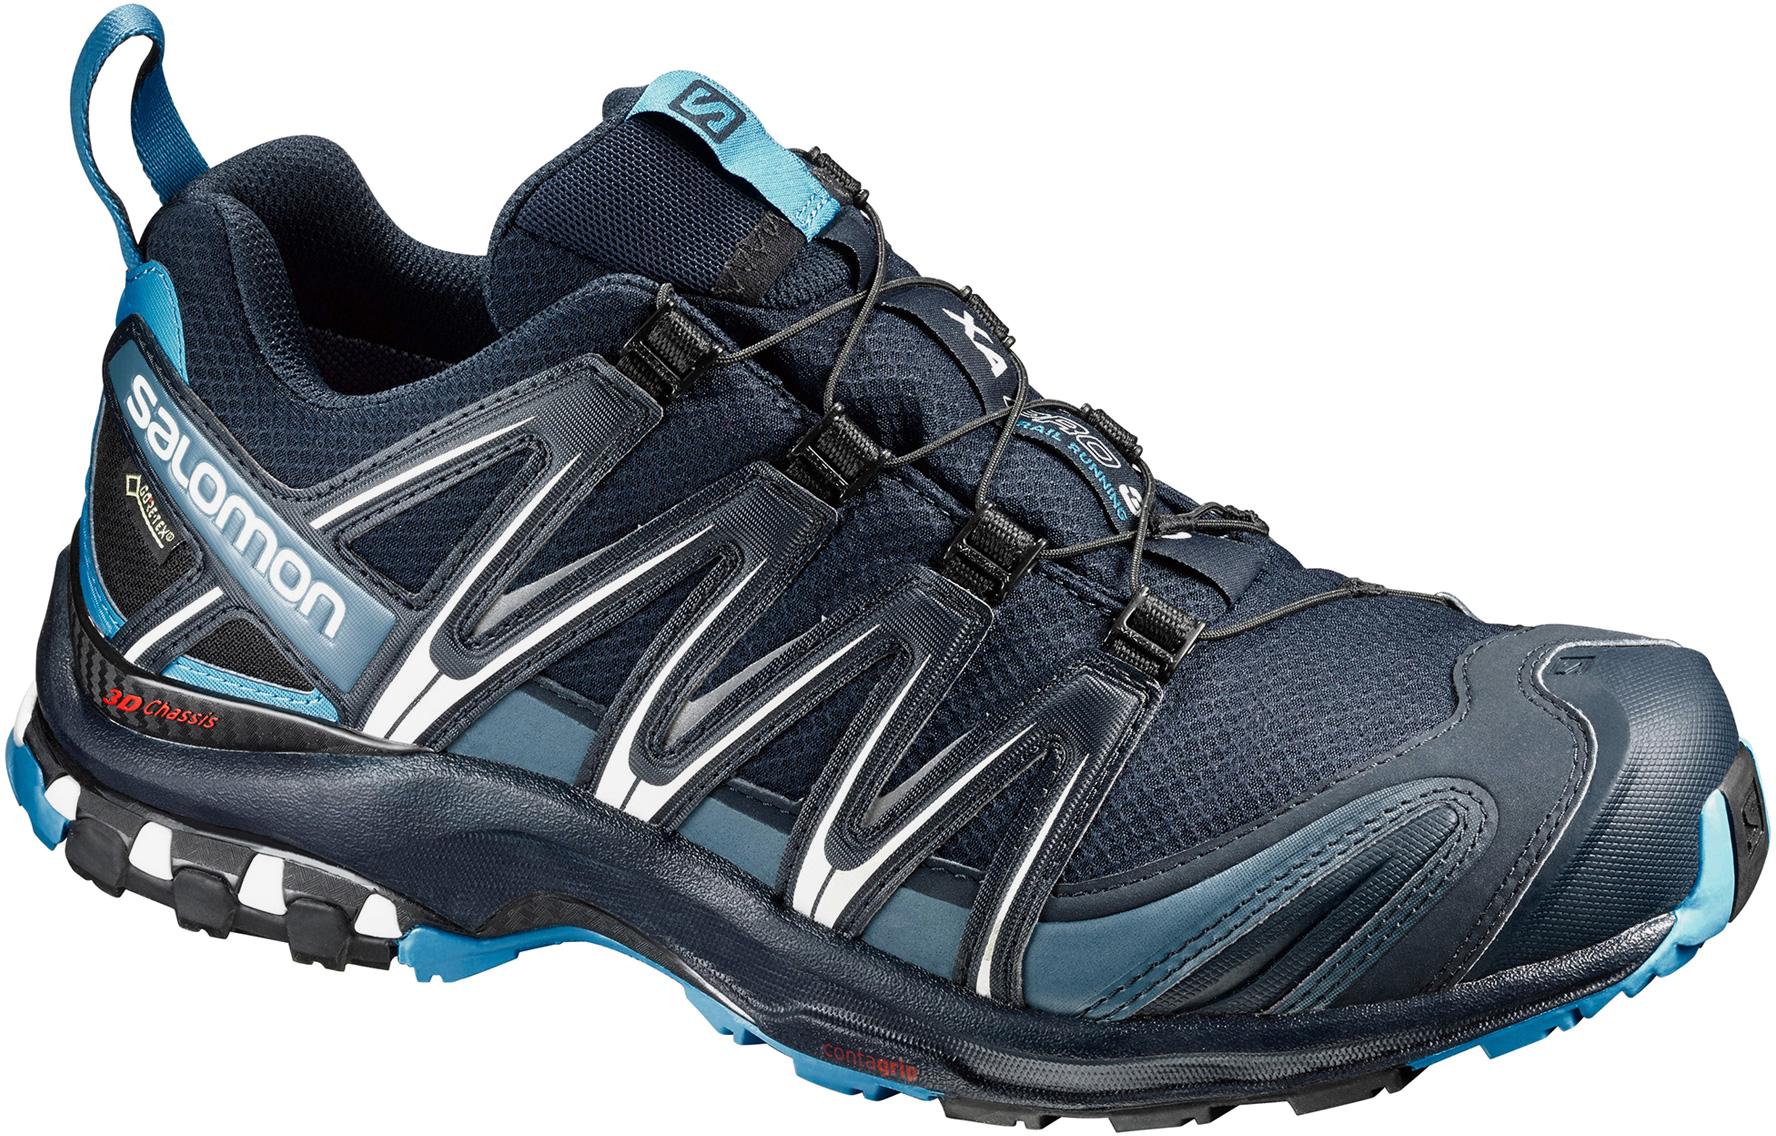 salomon xa pro 3d gore tex waterproof mens trail shoes